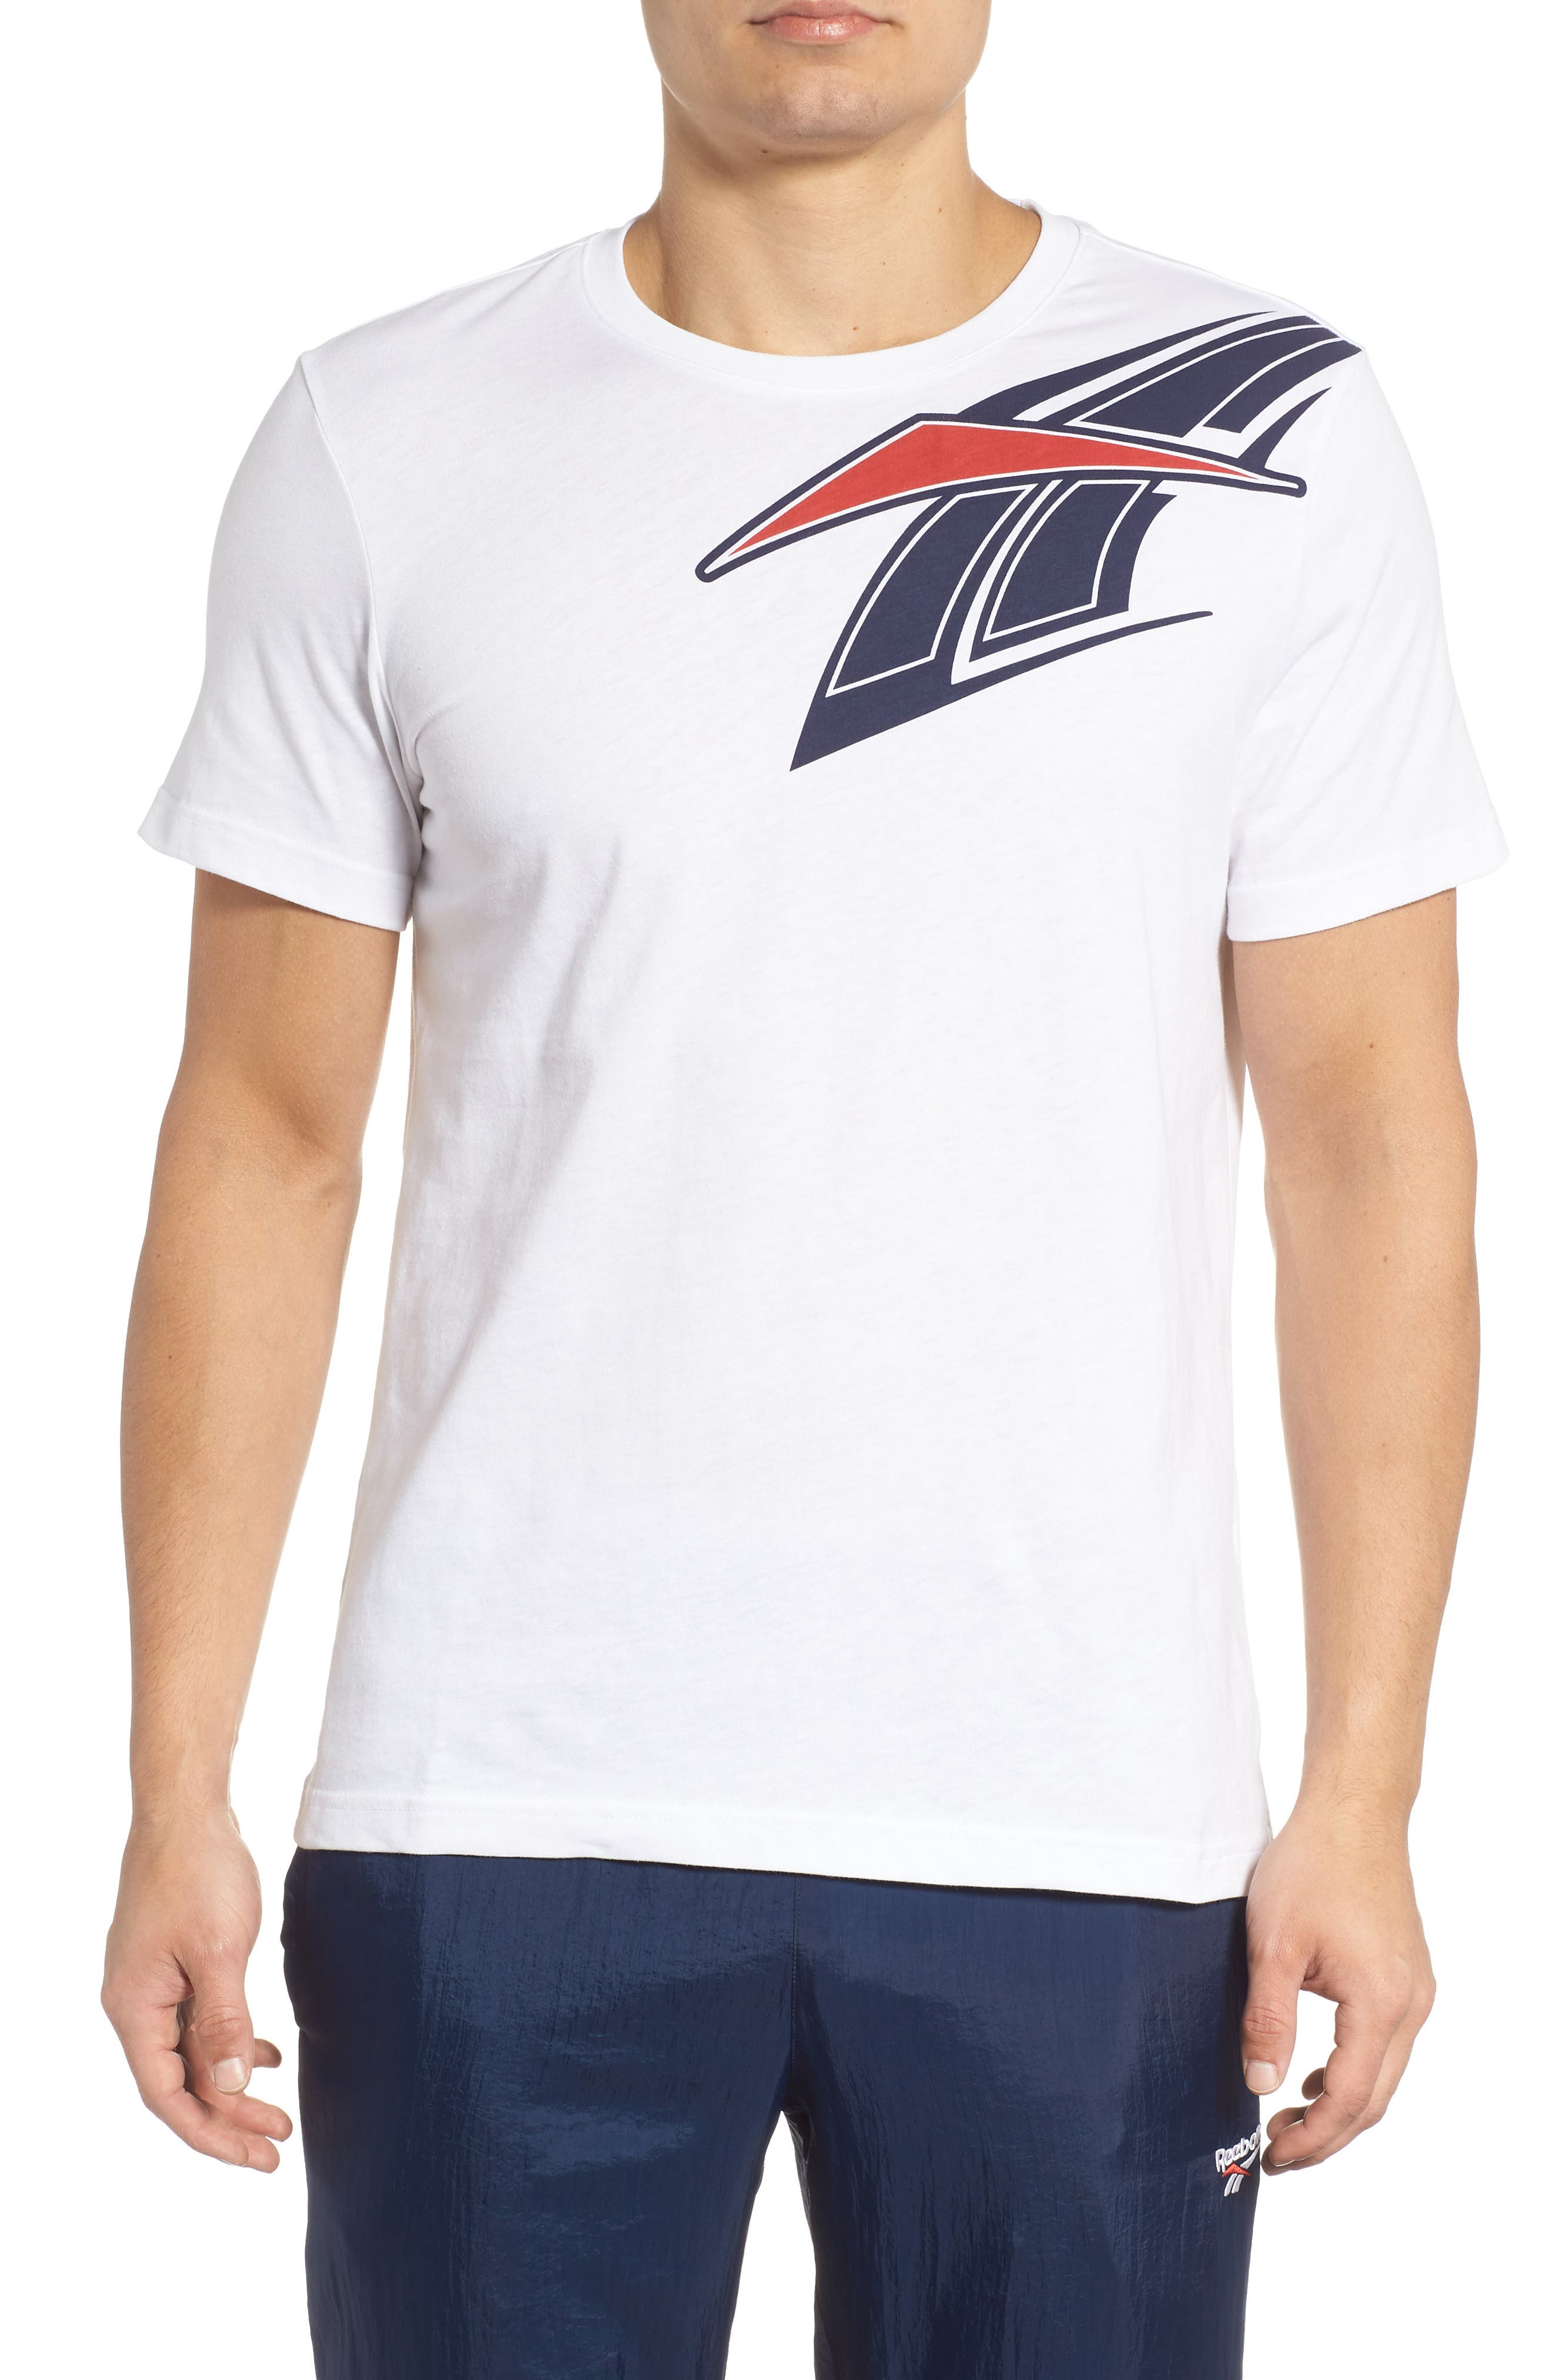 B-Ball Vector Logo T-Shirt,                             Main thumbnail 1, color,                             WHITE